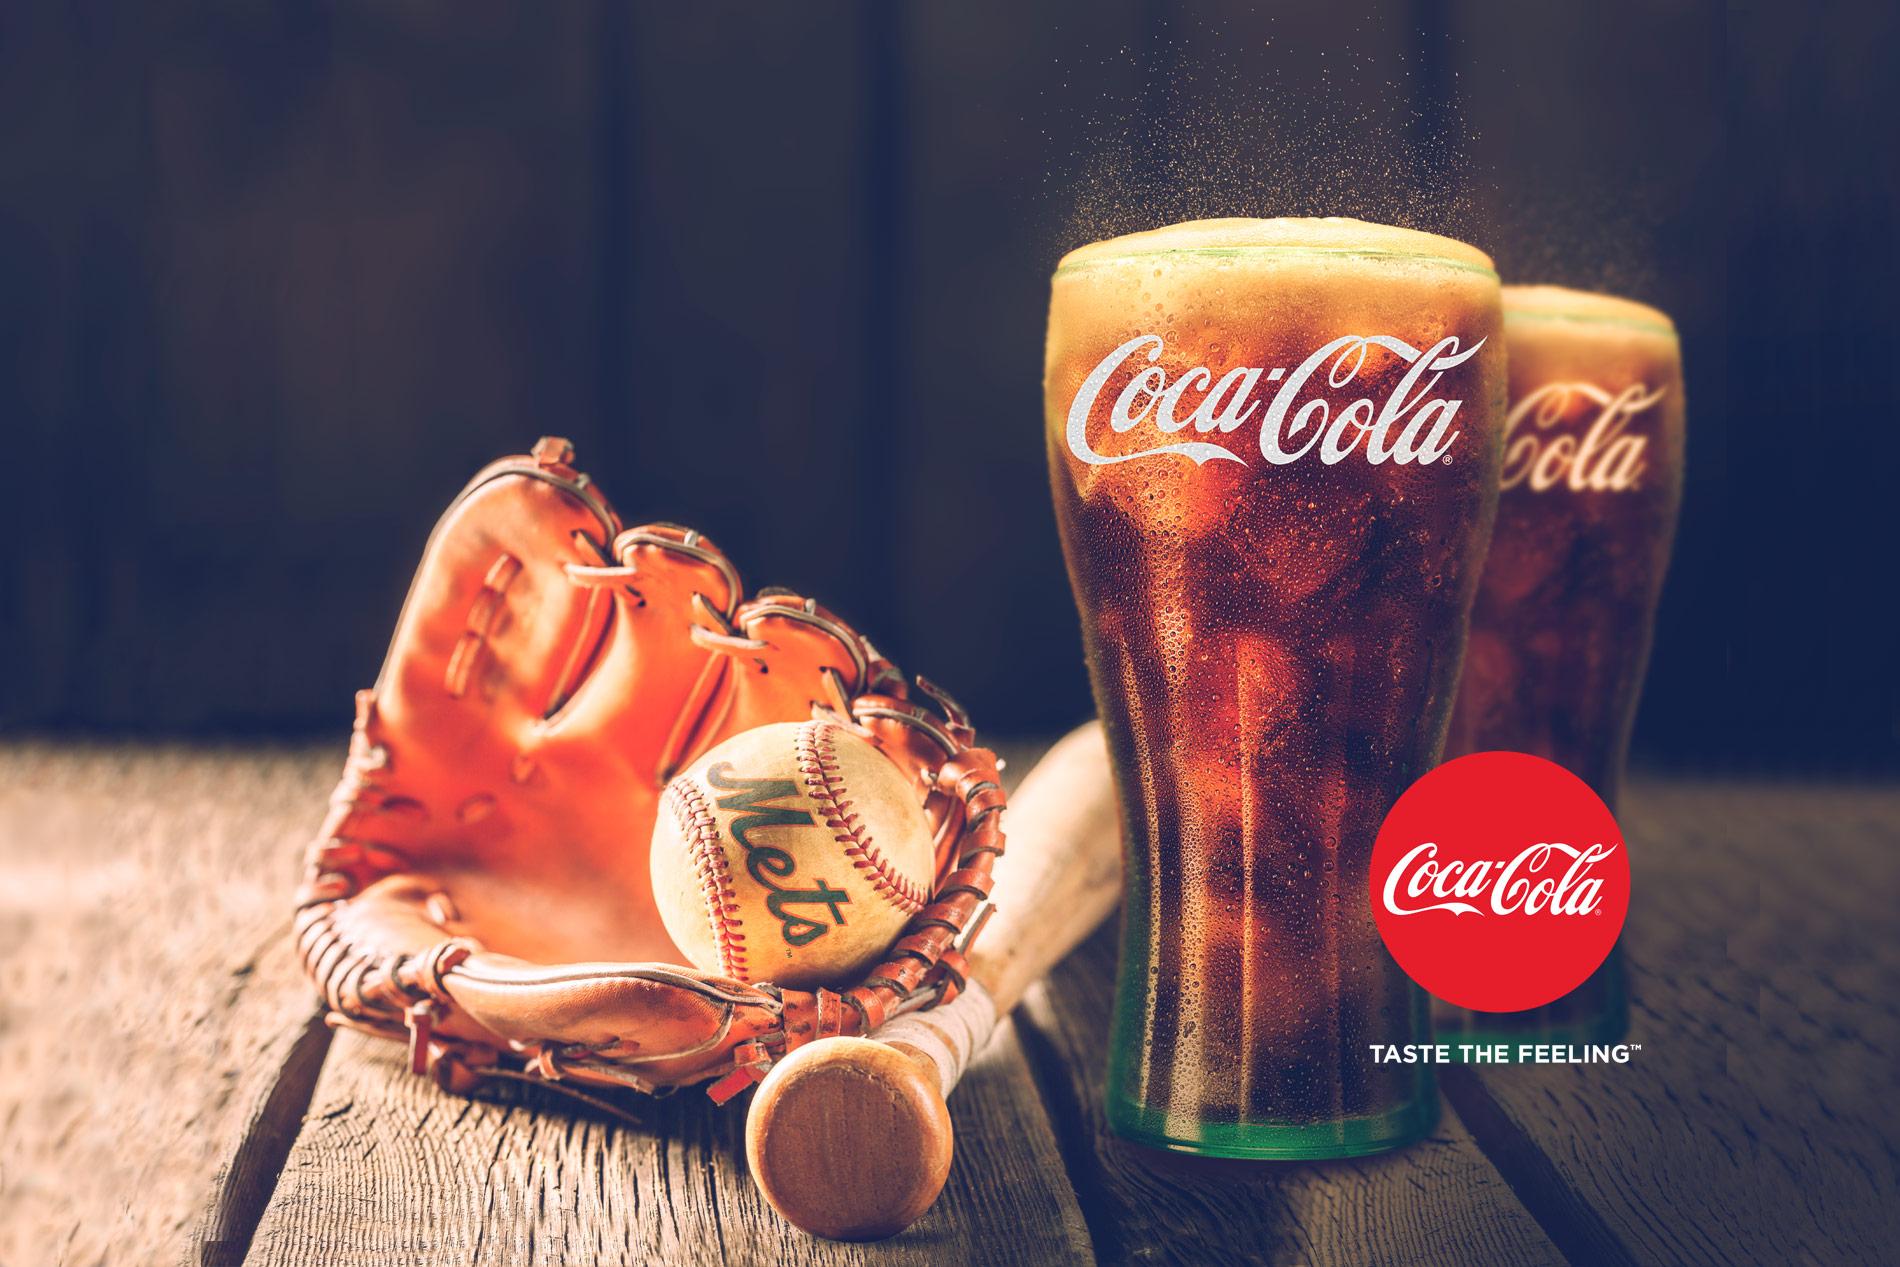 Coca-Cola NY Mets / CitiField Activation